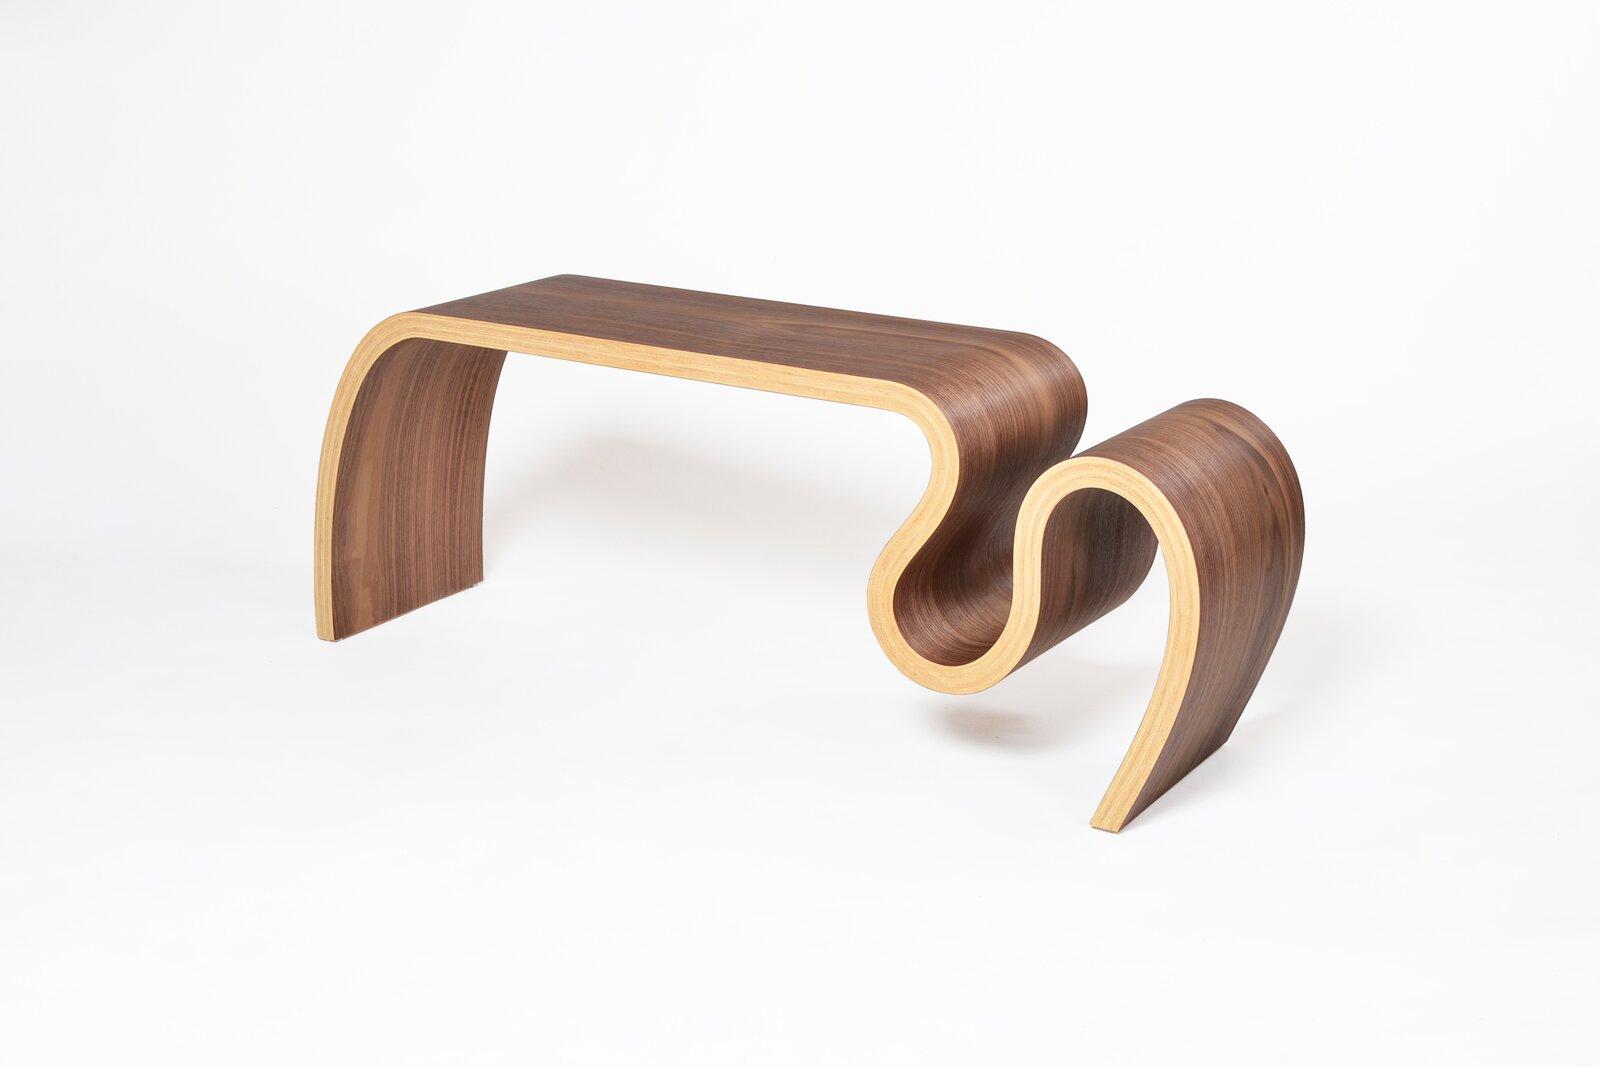 A coffee table design by Kino Guérin  Photo 4 of 5 in Designer to Know: Kino Guérin